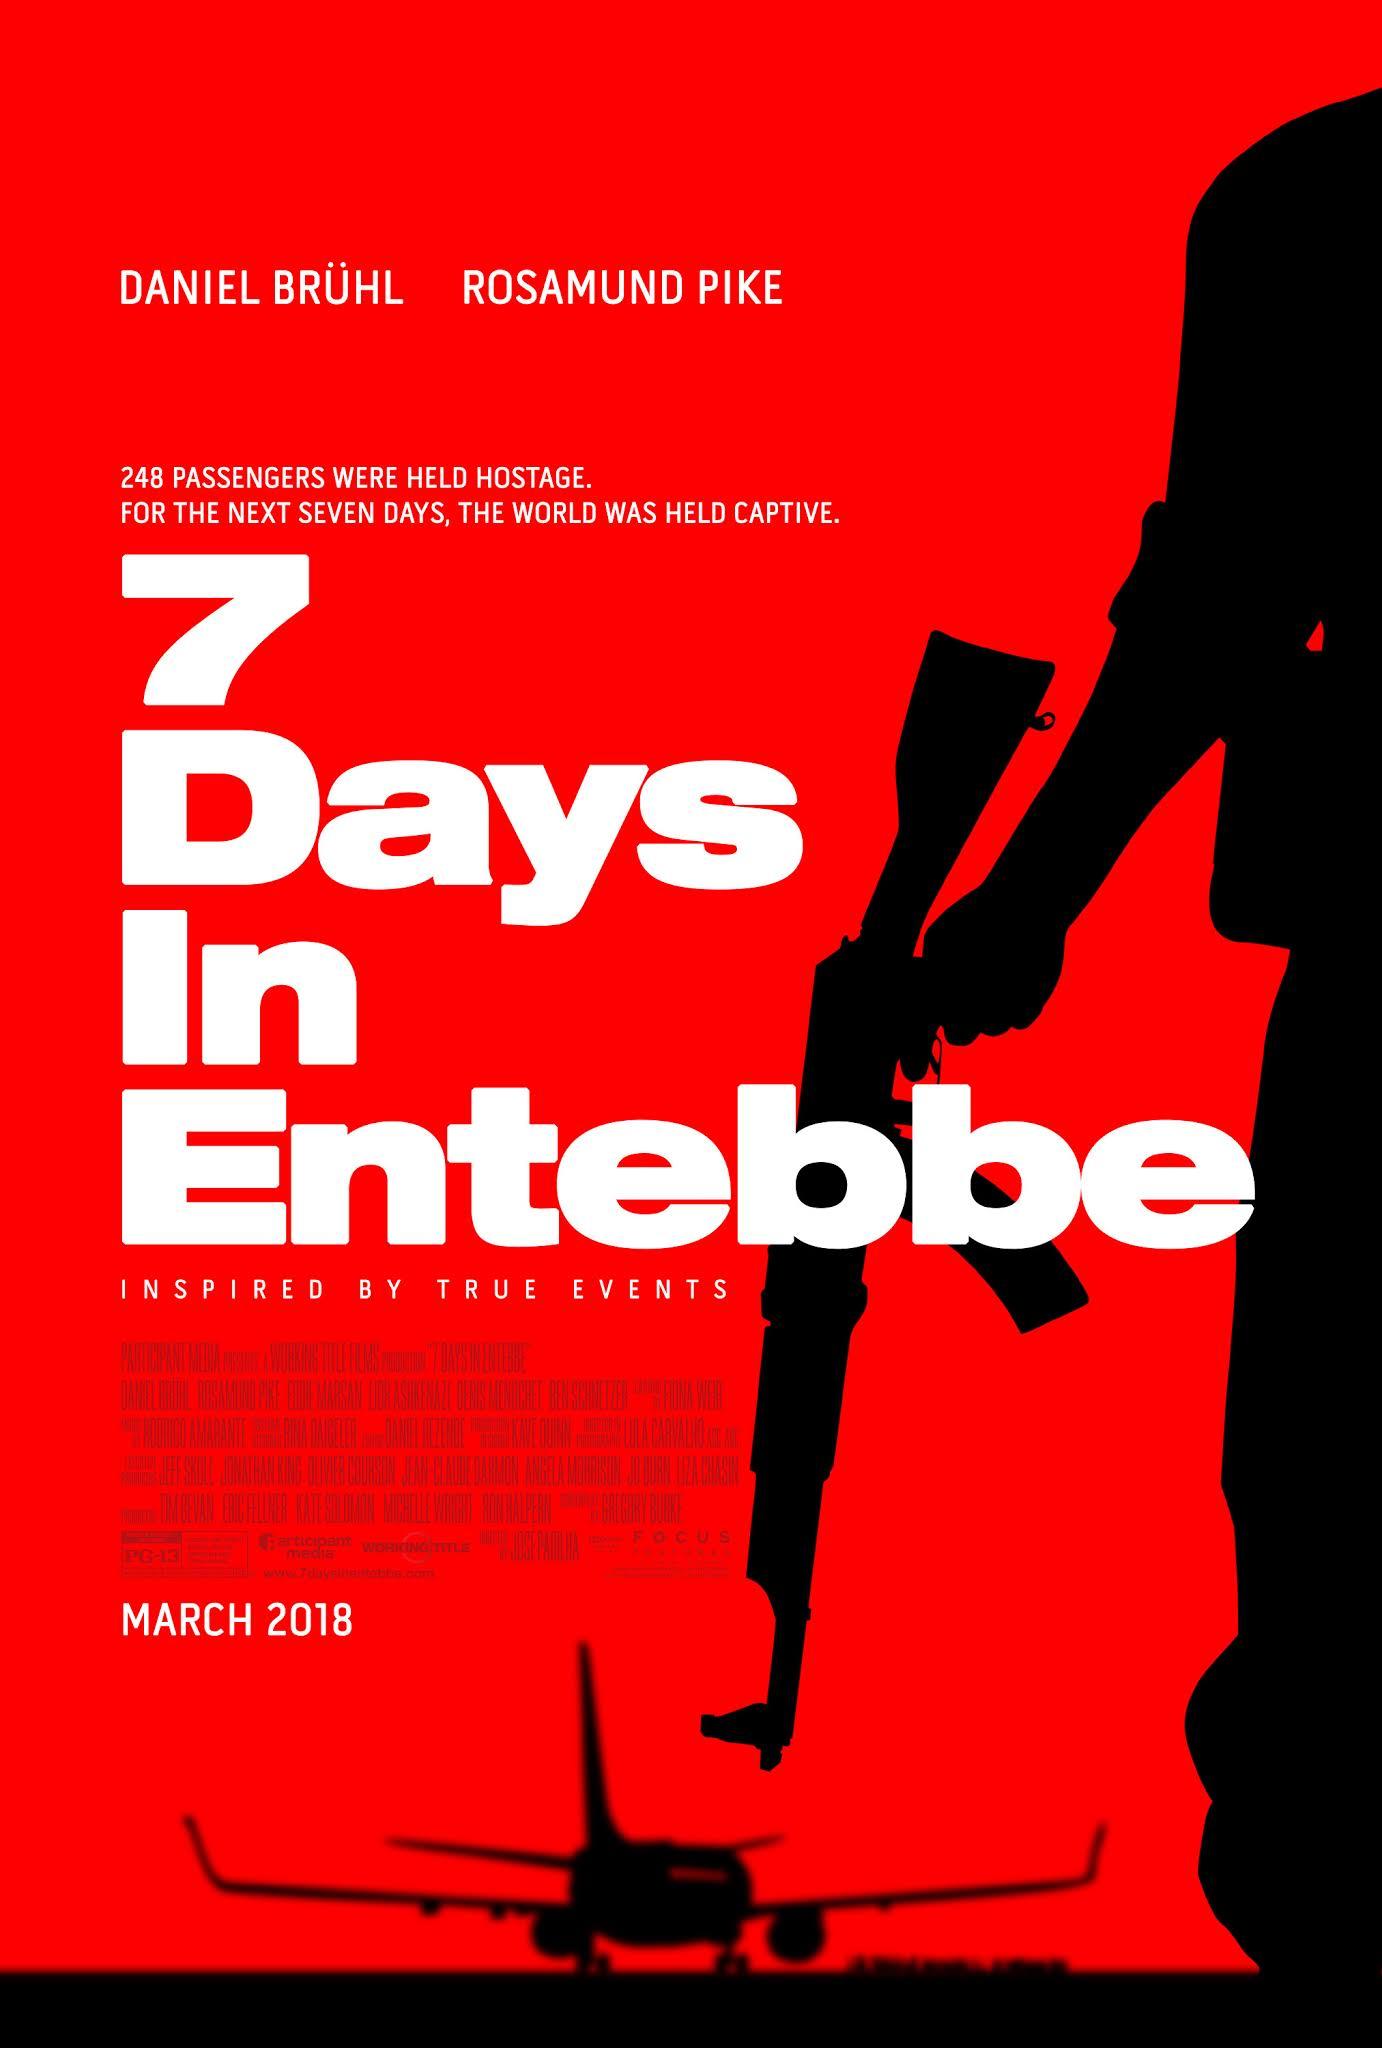 7 dni film recenzja daniel bruhl